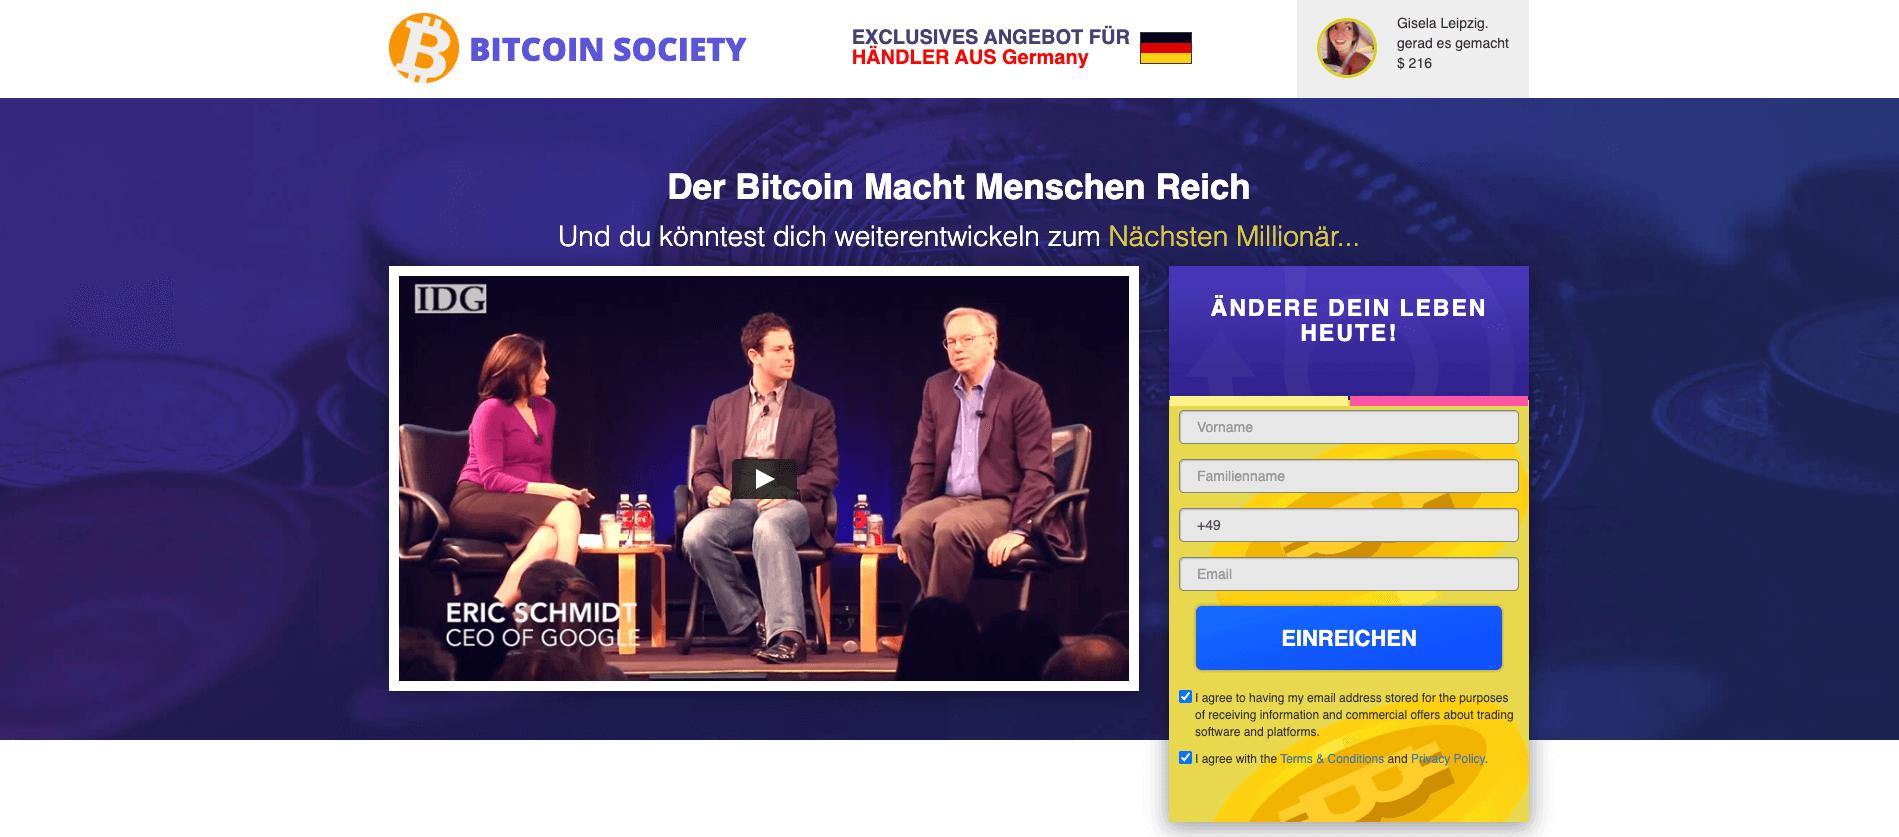 Bitcoin Society Title Image